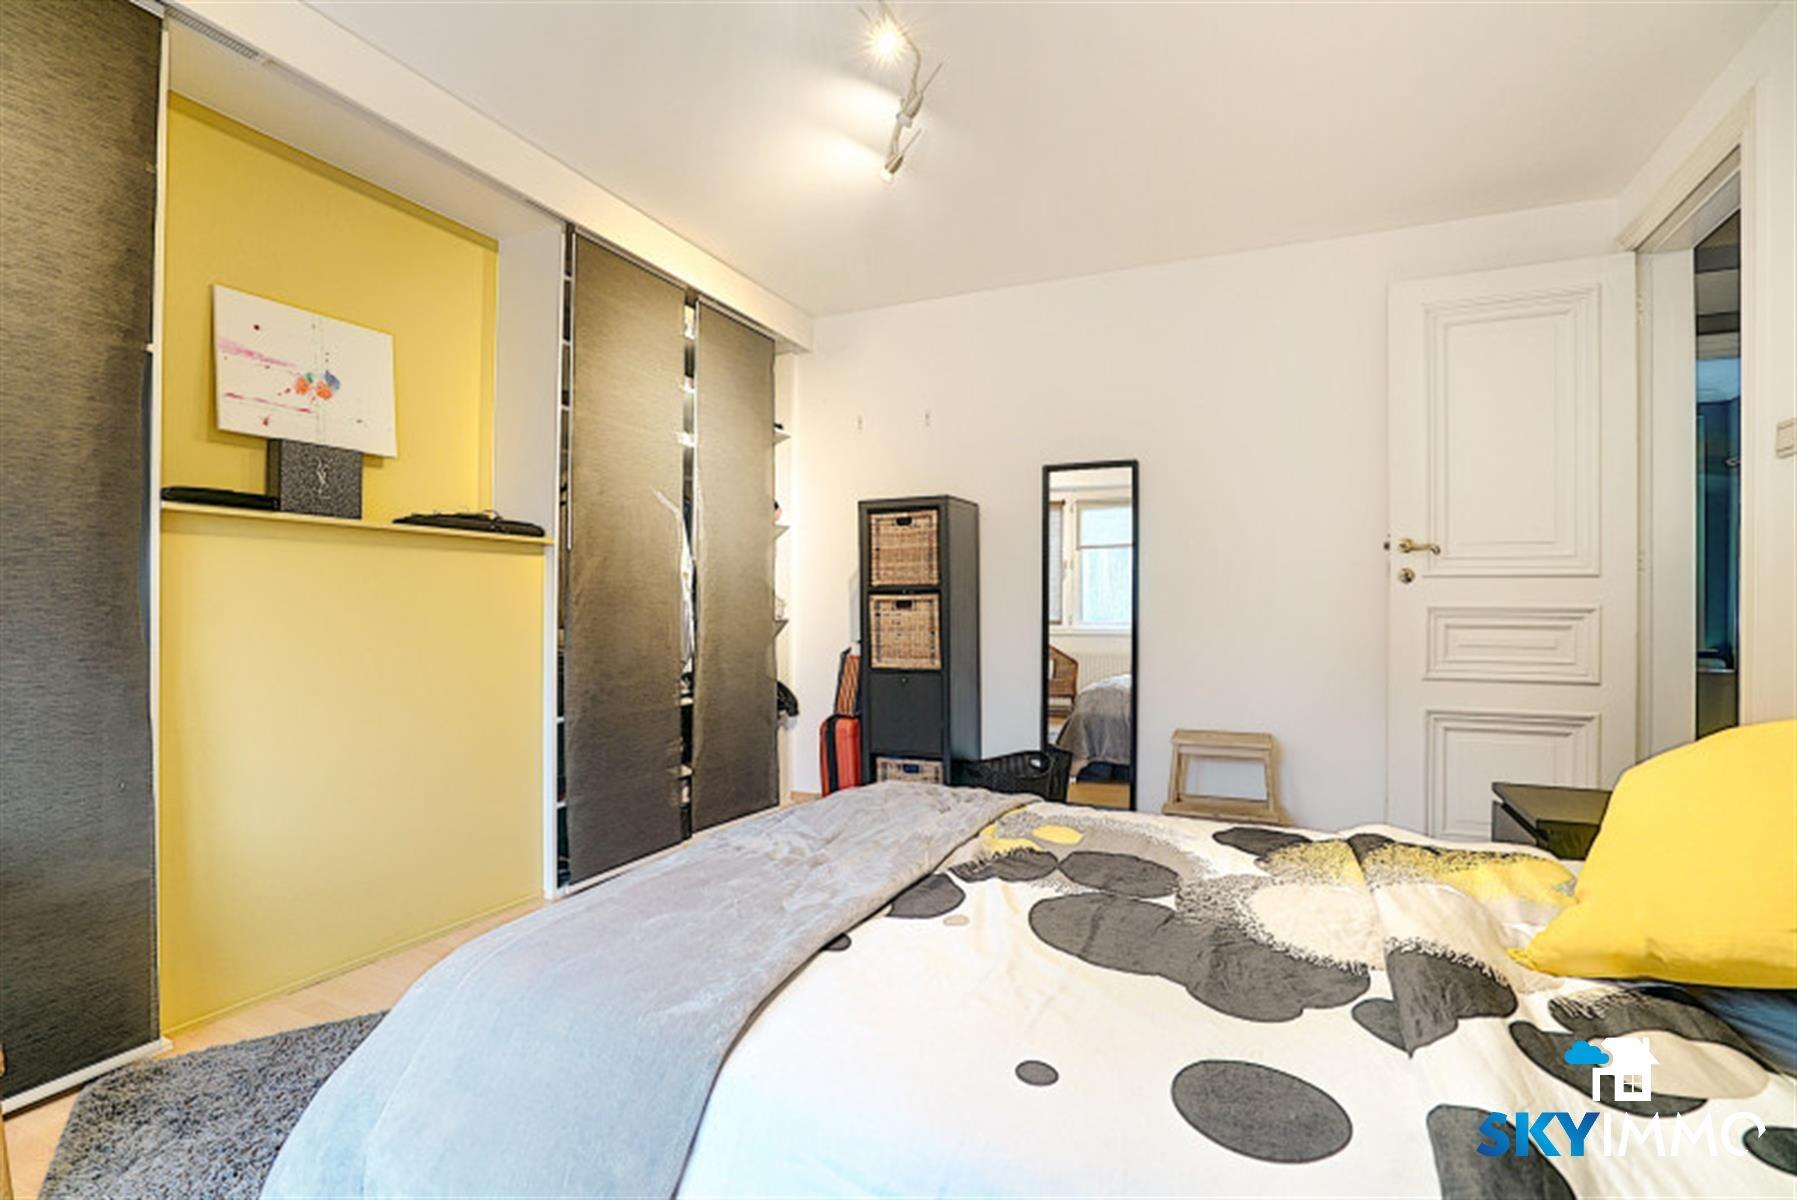 Huis - Liège - #4262984-47